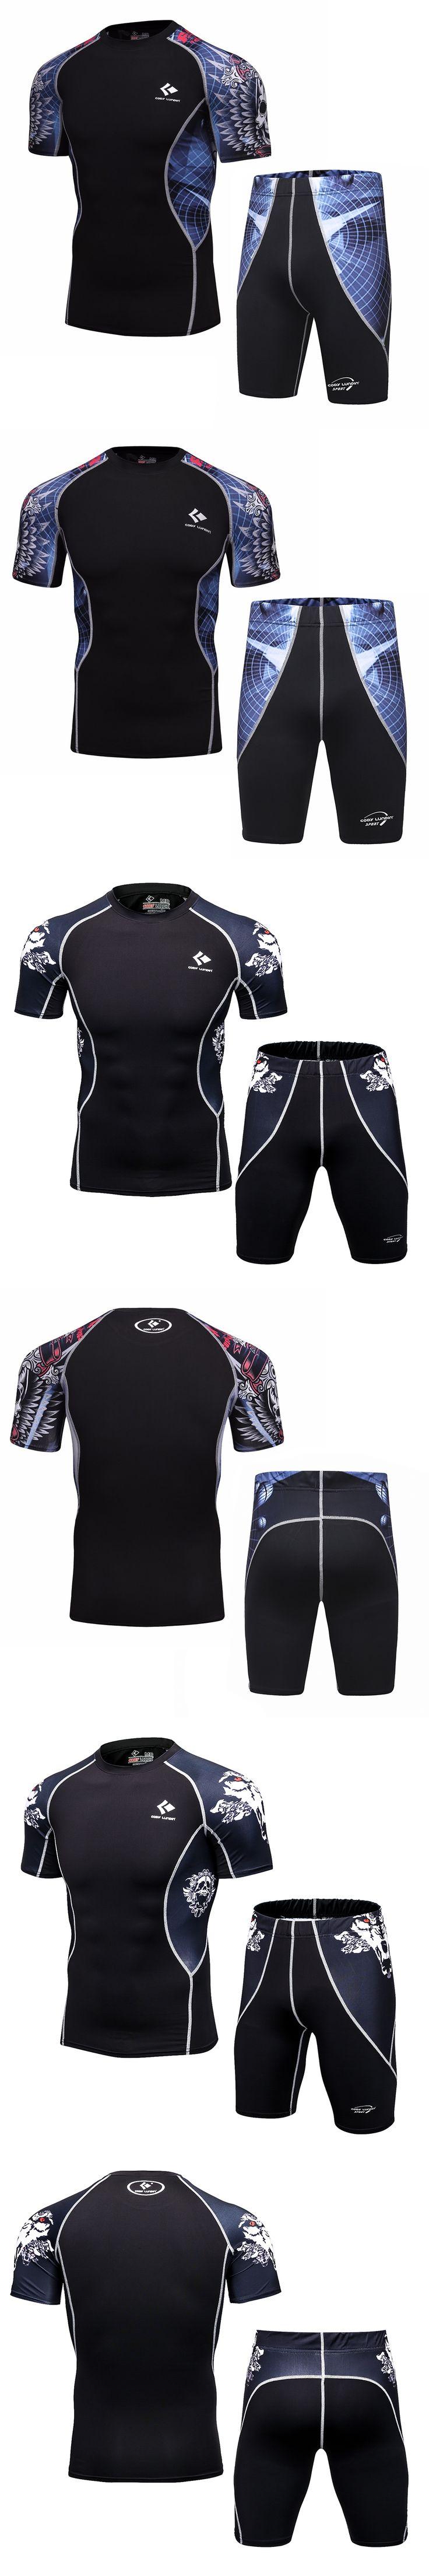 Men's Shirt Base Layer Suits 3D Teenager Short Sleeve + Short Pants Men's Lycra MMA Crossfit Tights Shorts Set Clothing